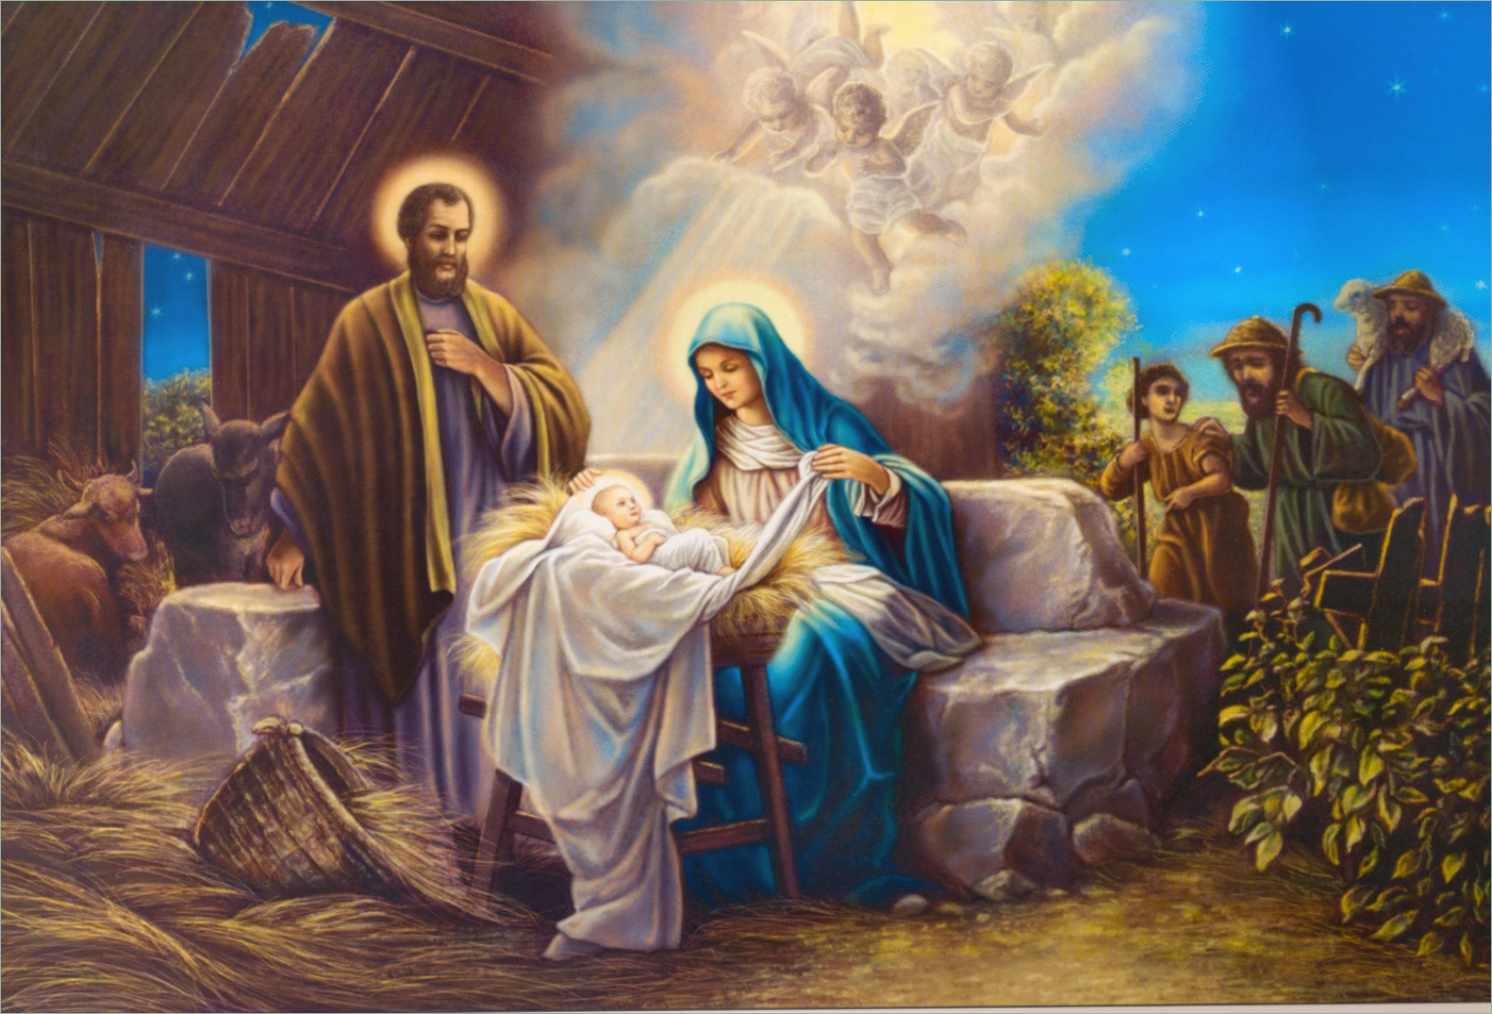 Prayer for the Intercession of St. Joseph in Dark Times